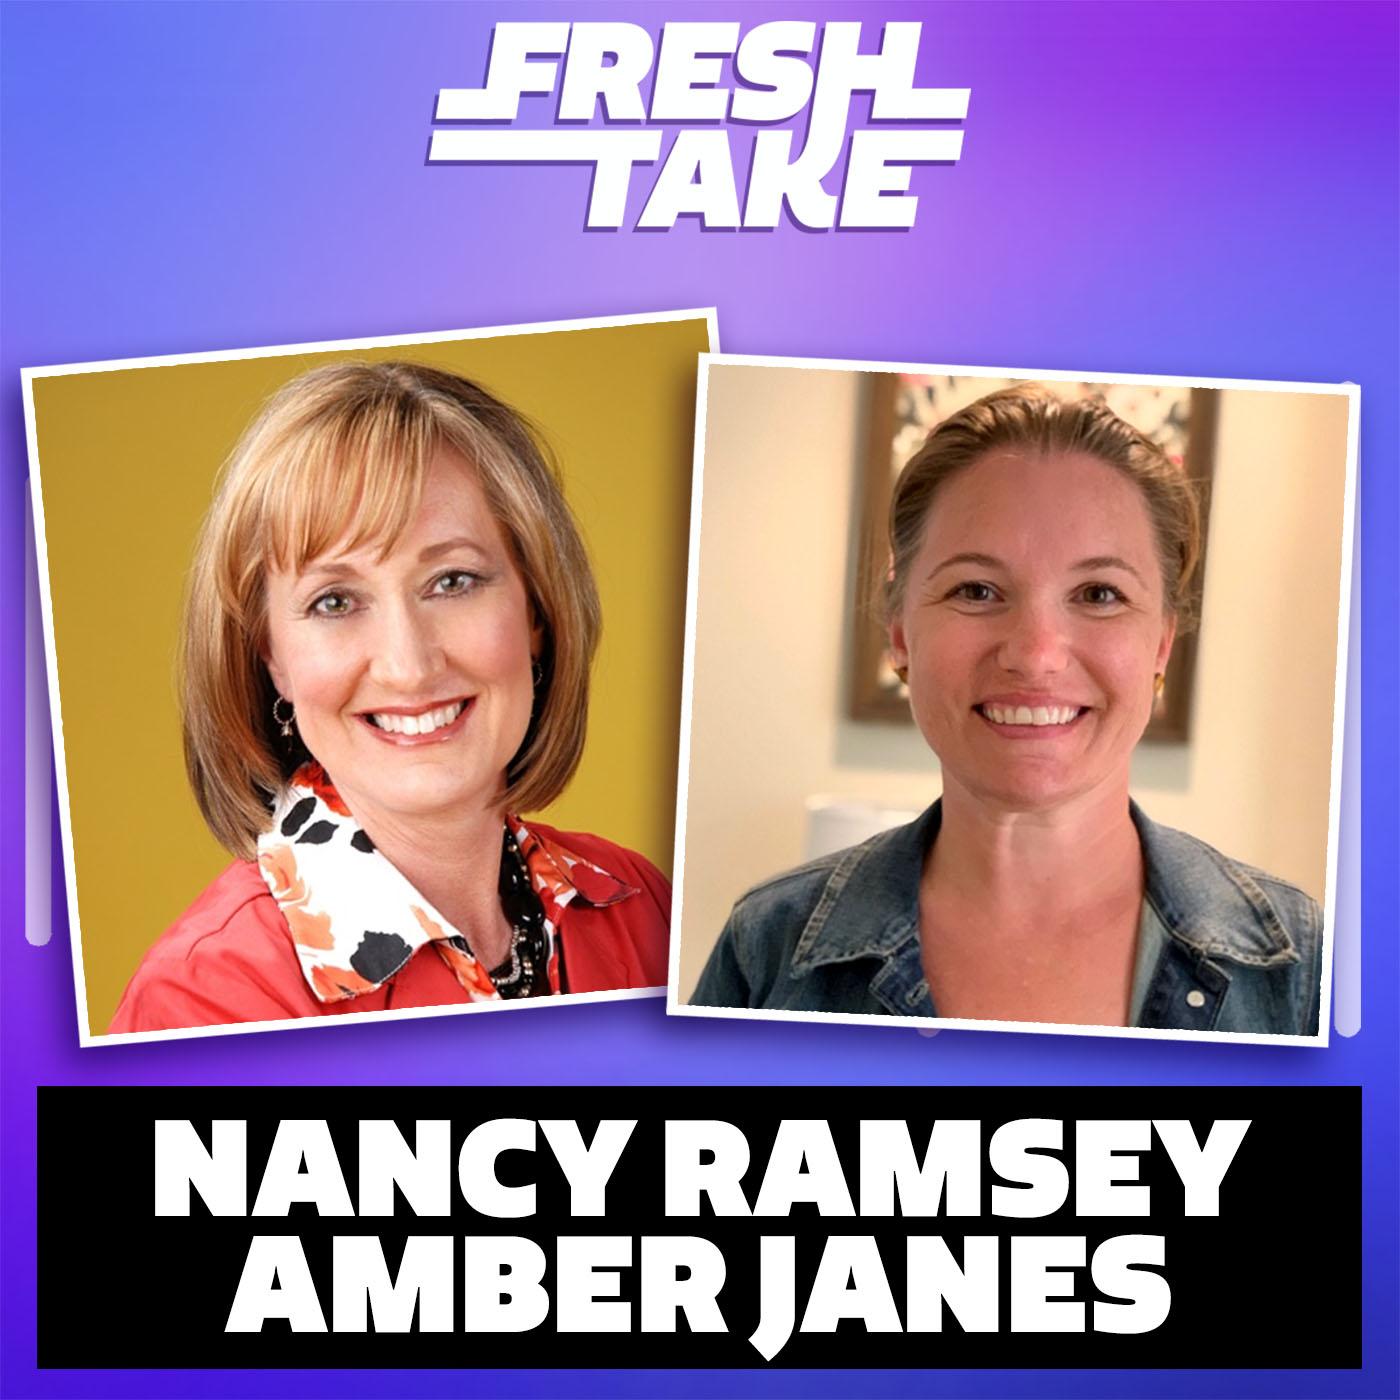 S01E05 - Nancy Amber.jpg